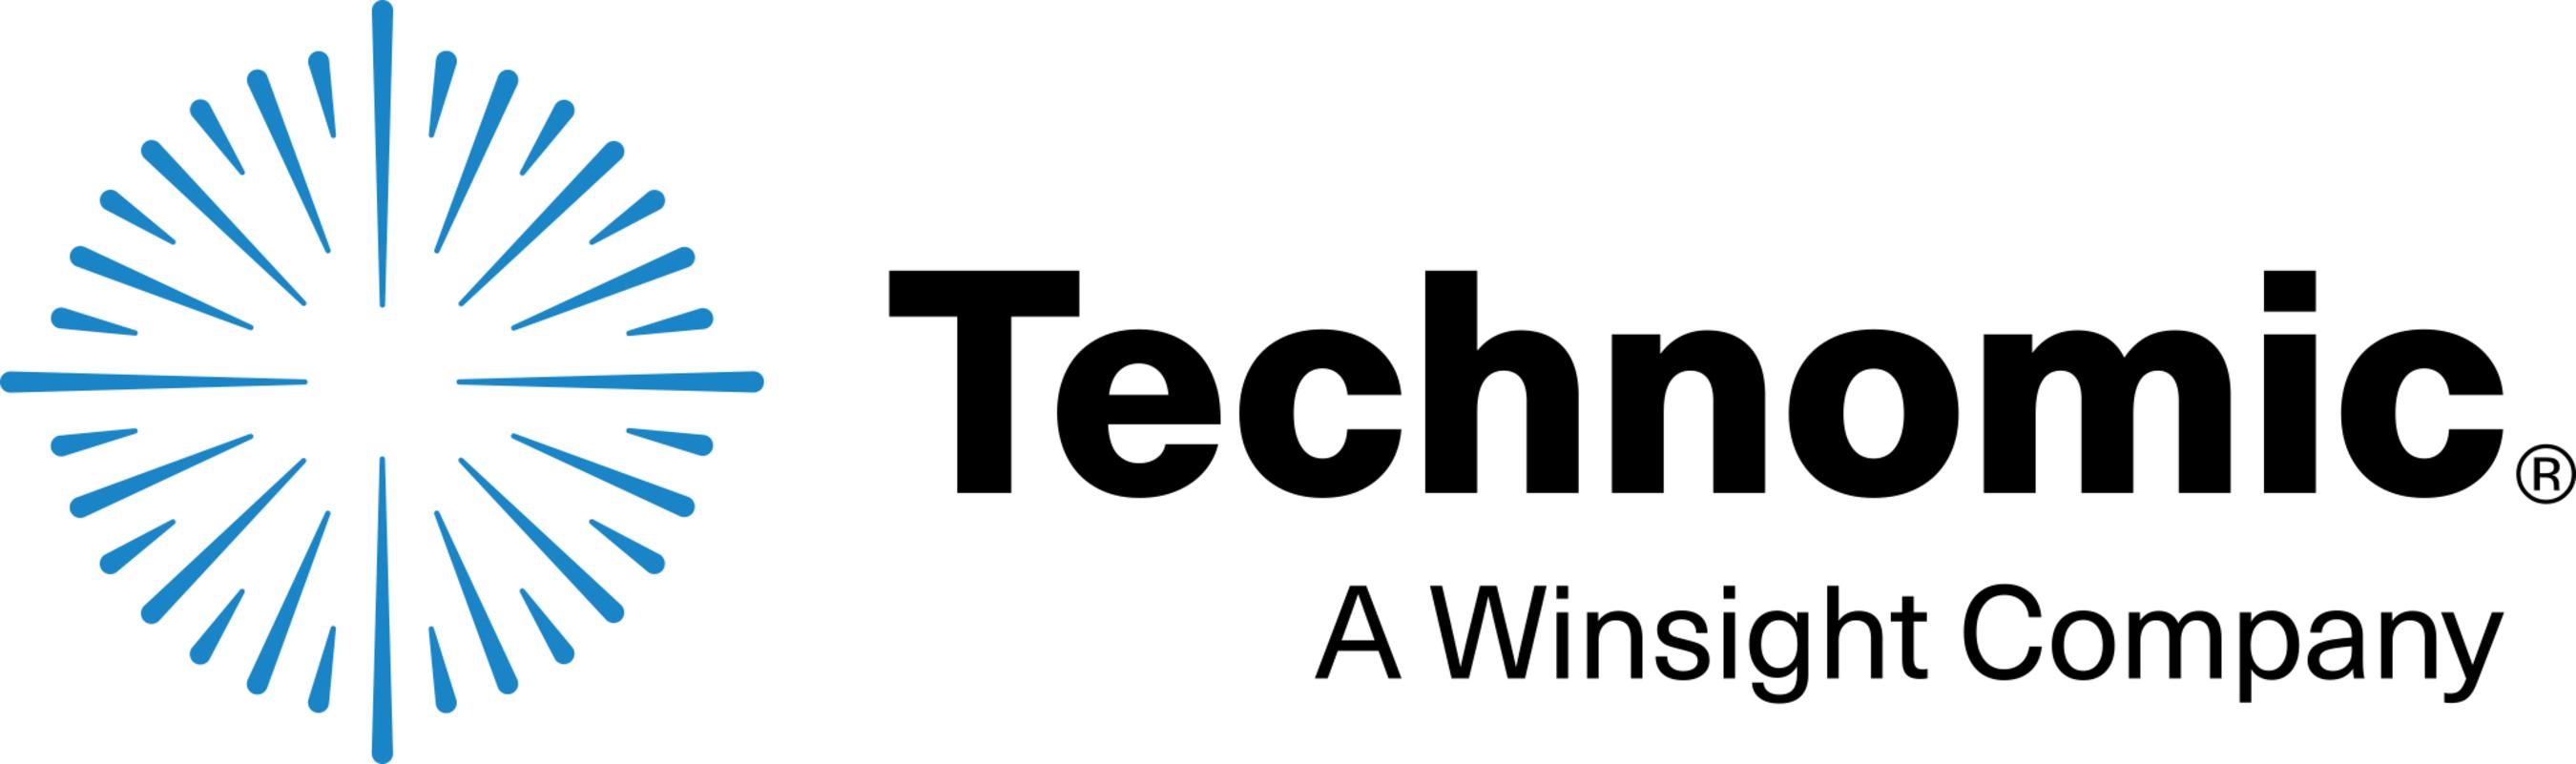 Technomic Inc. Logo.